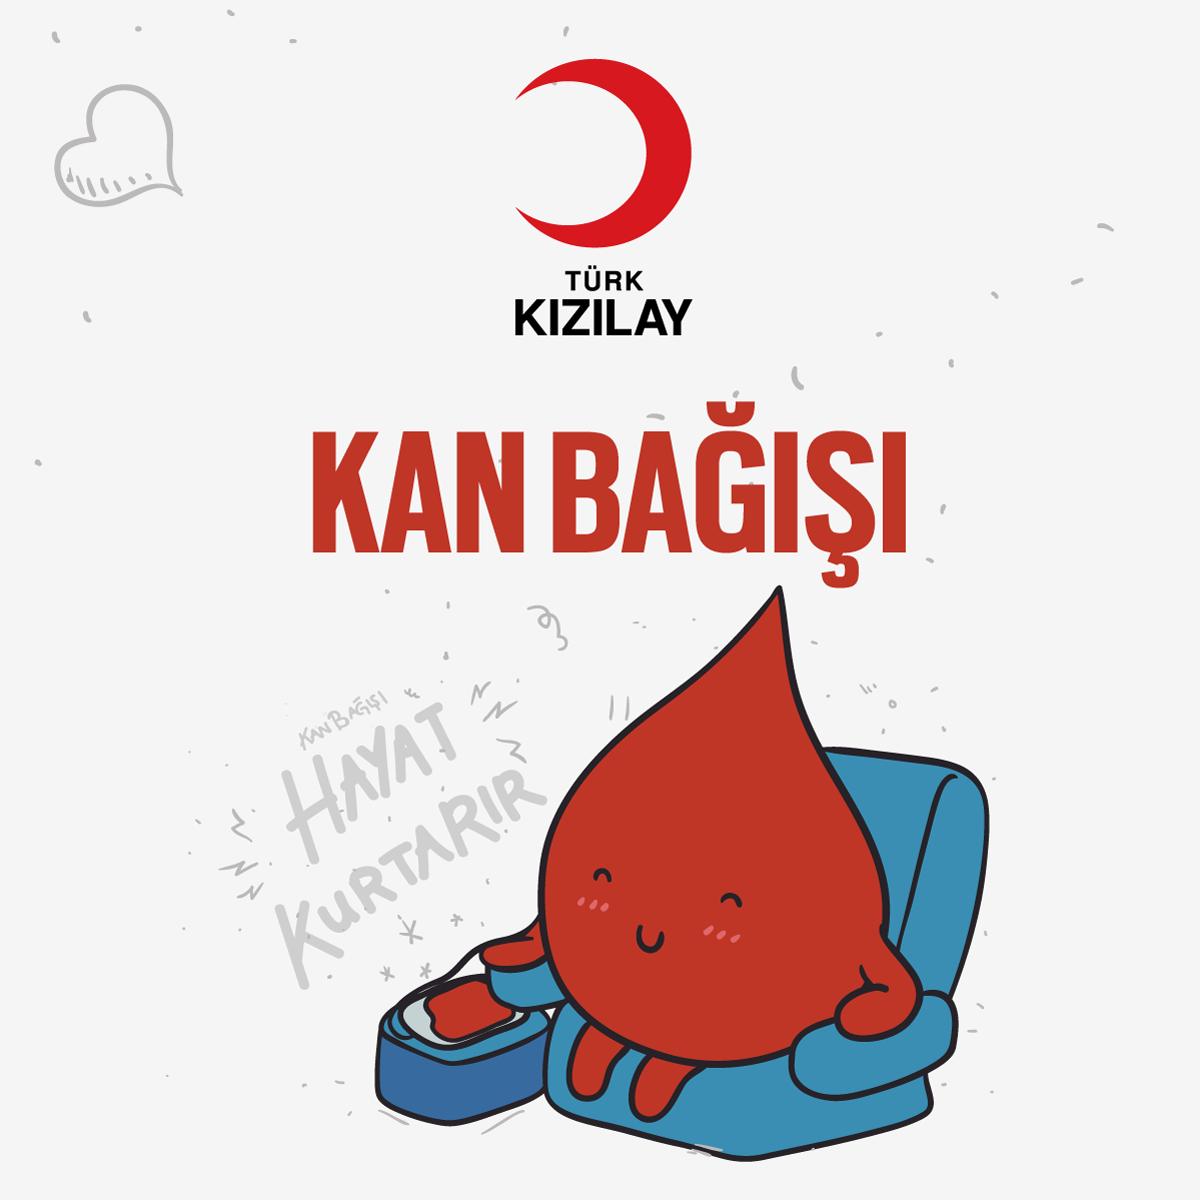 kizilay-kan-bagisi